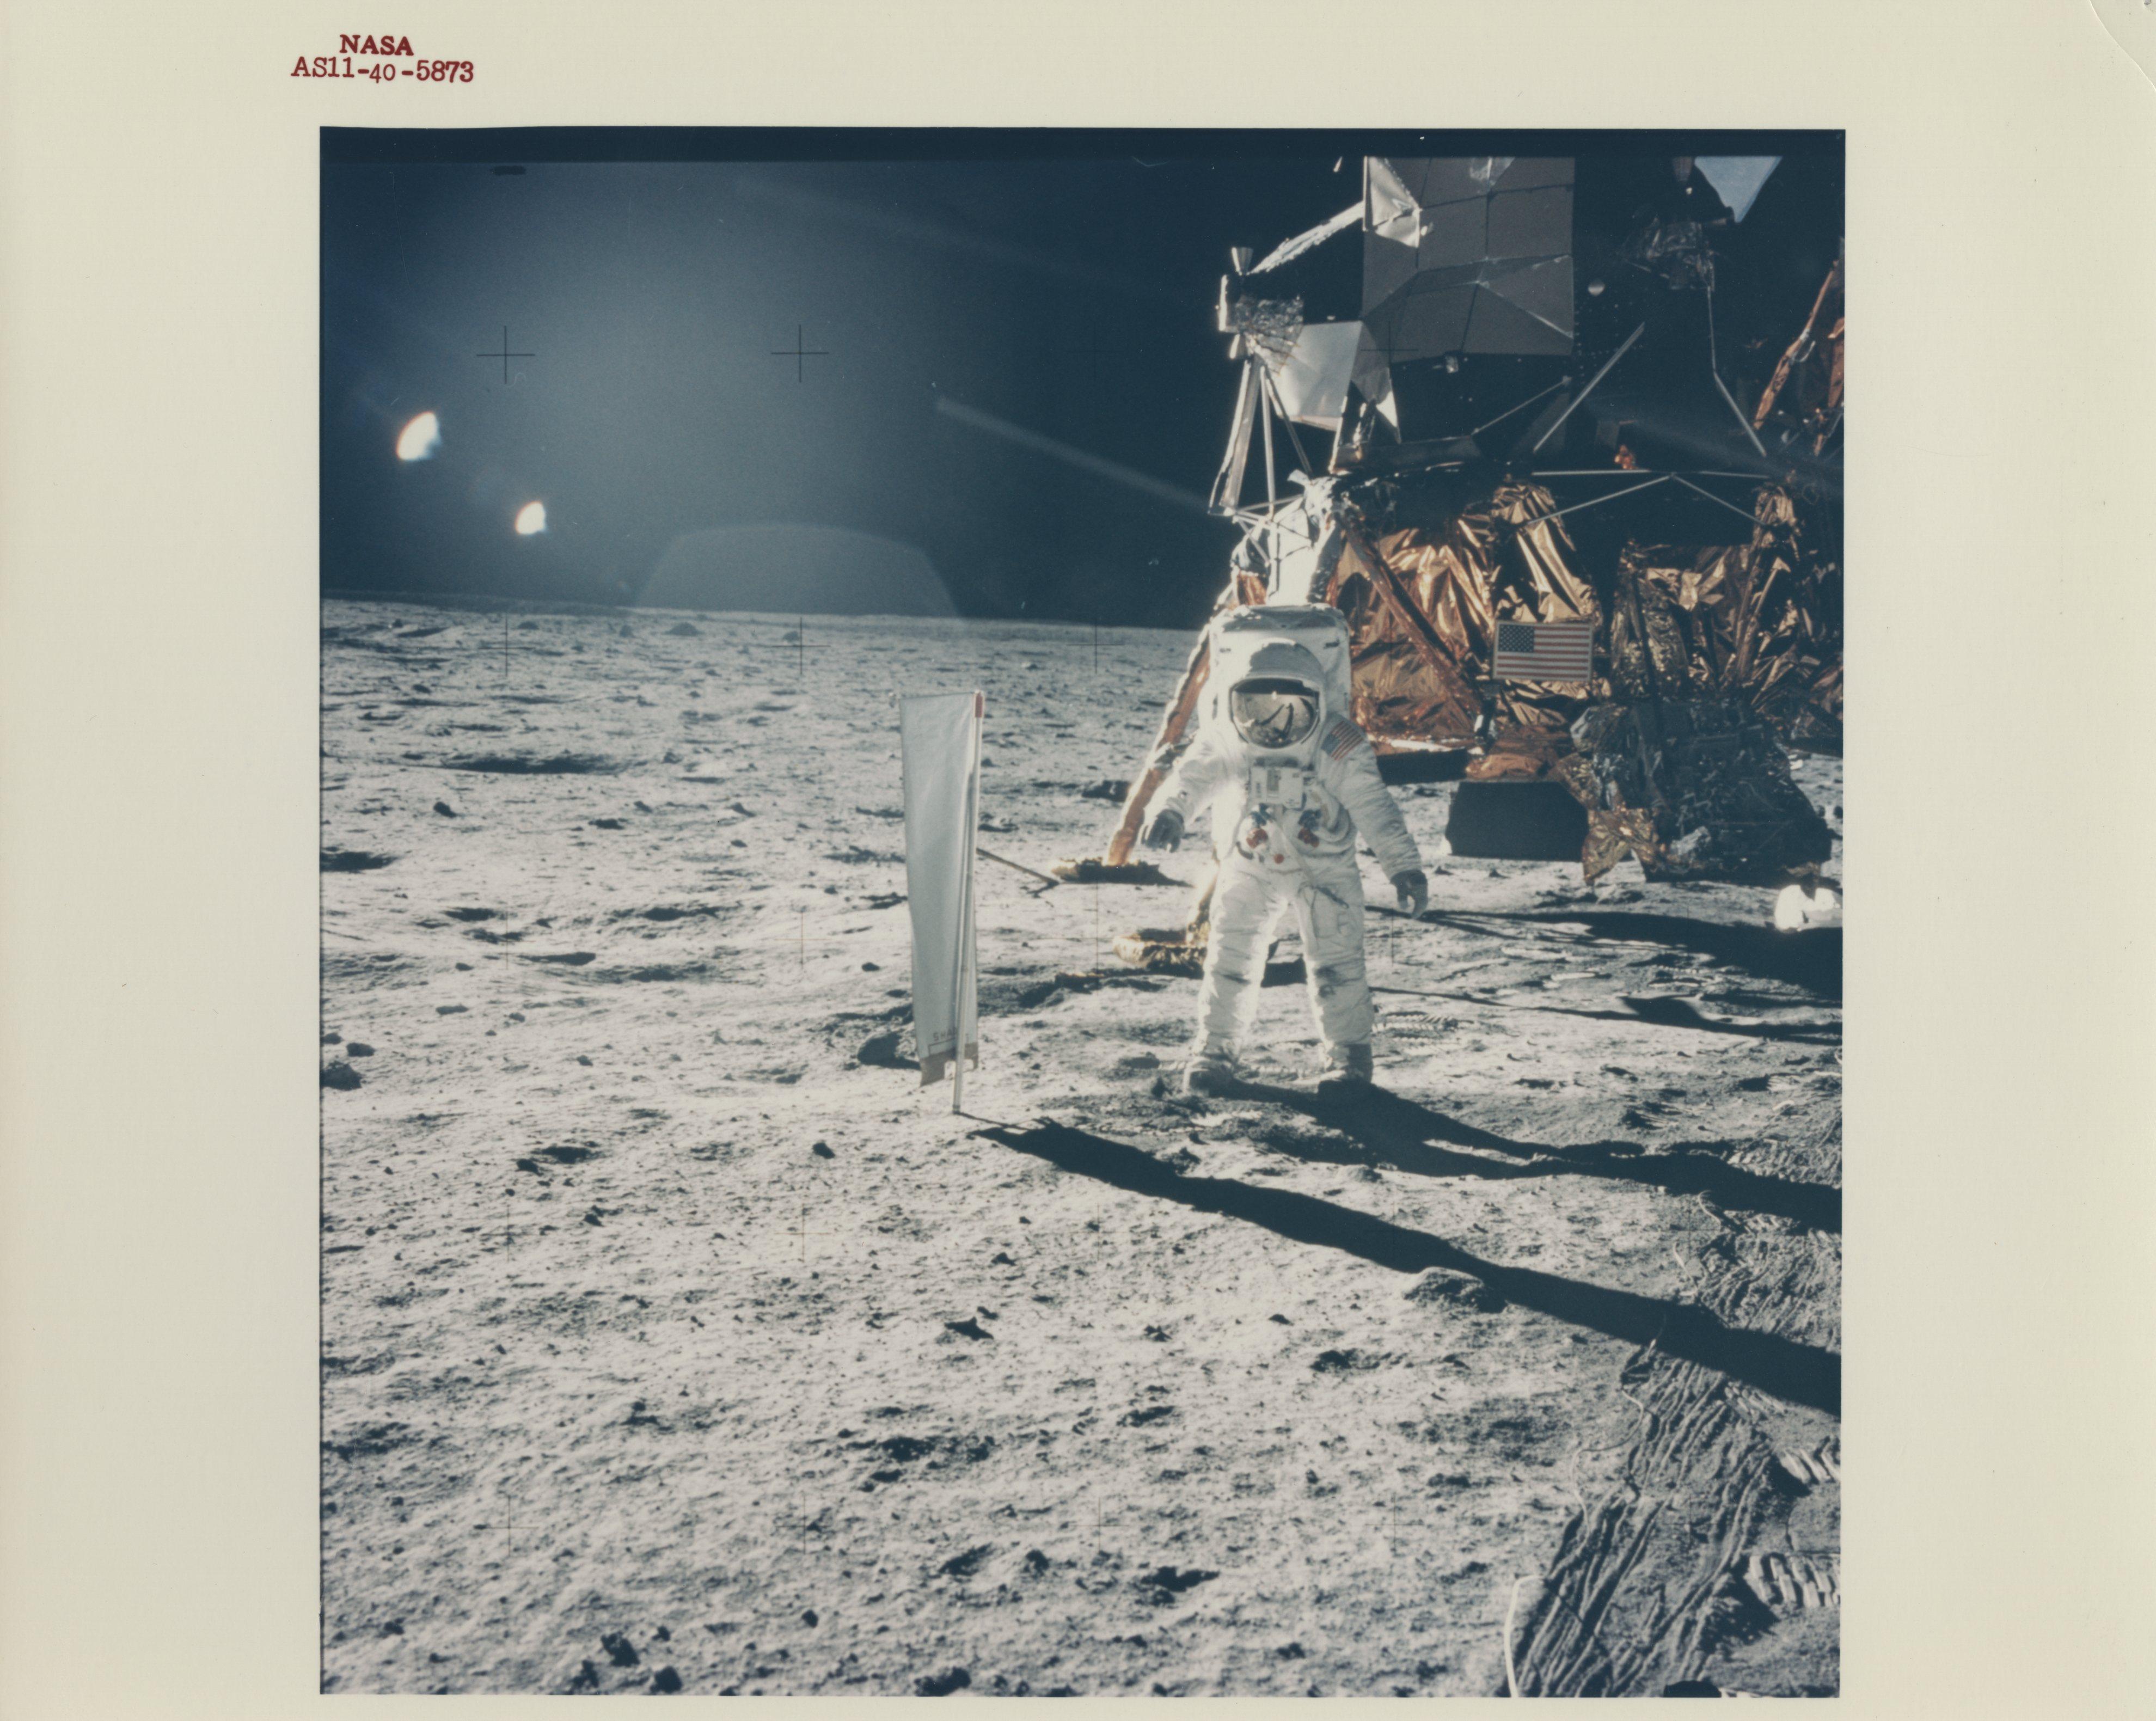 lunarlandingphoto002